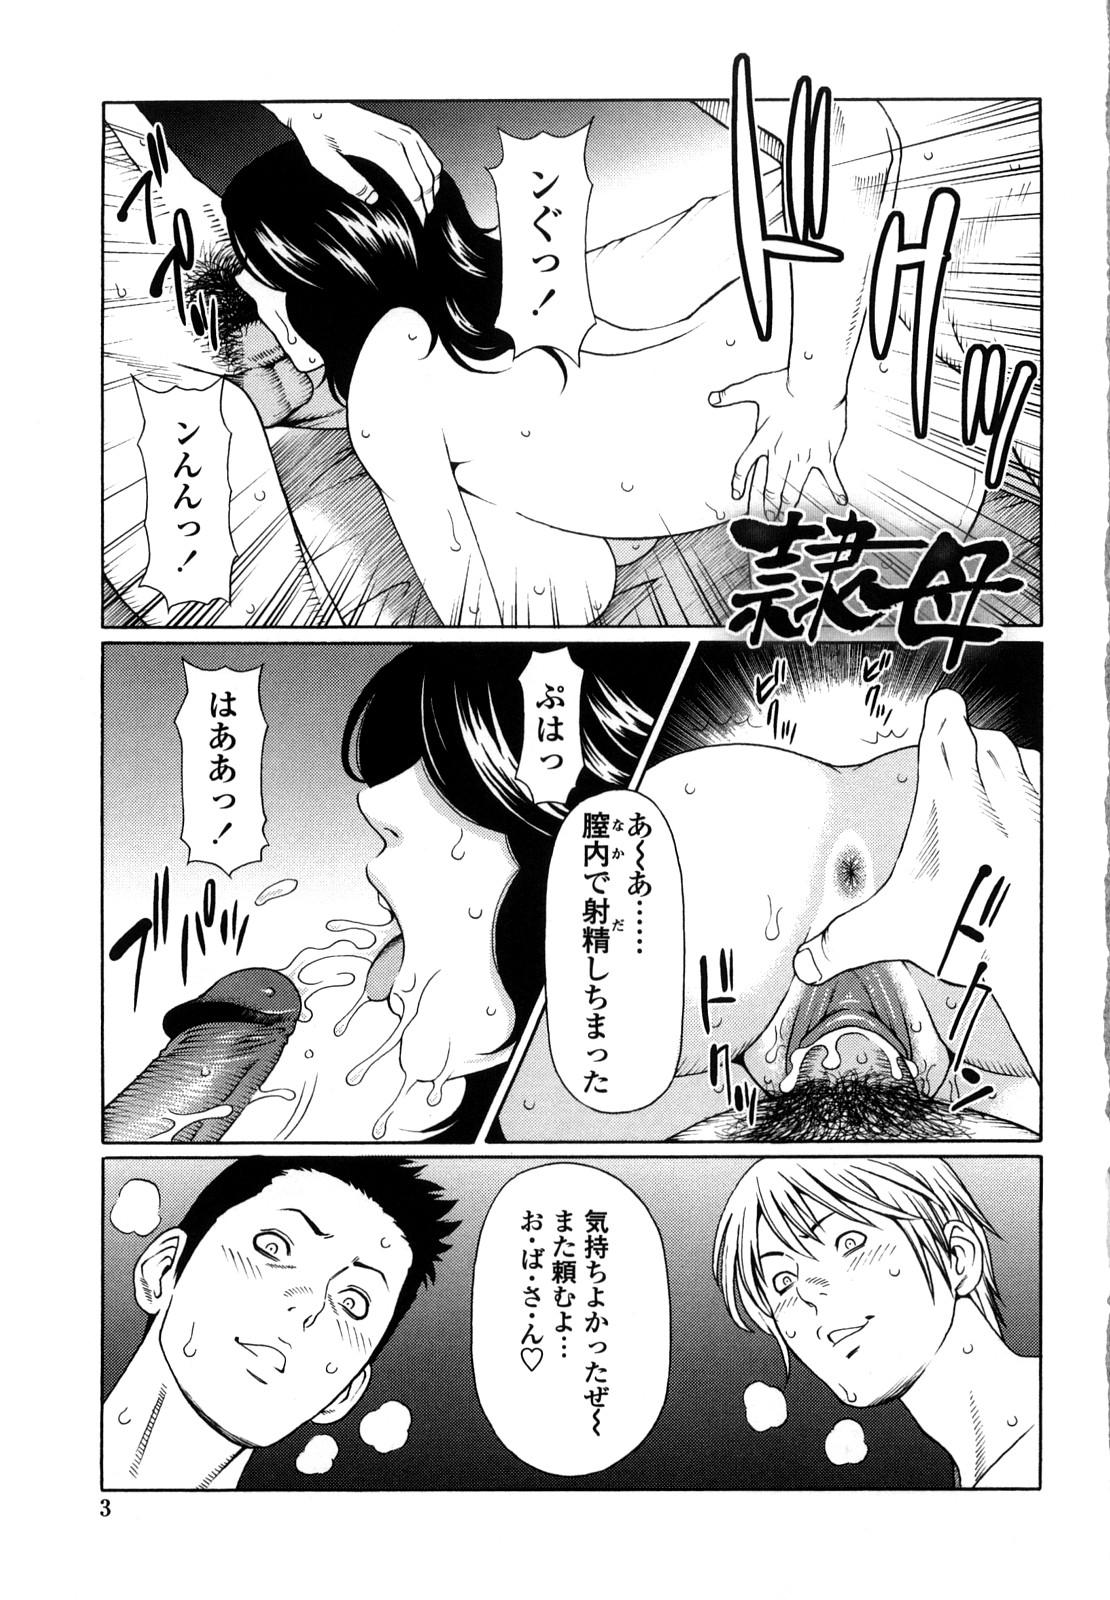 [Takasugi Kou] Kindan no Haha-Ana - Immorality Love-Hole [Decensored] 4